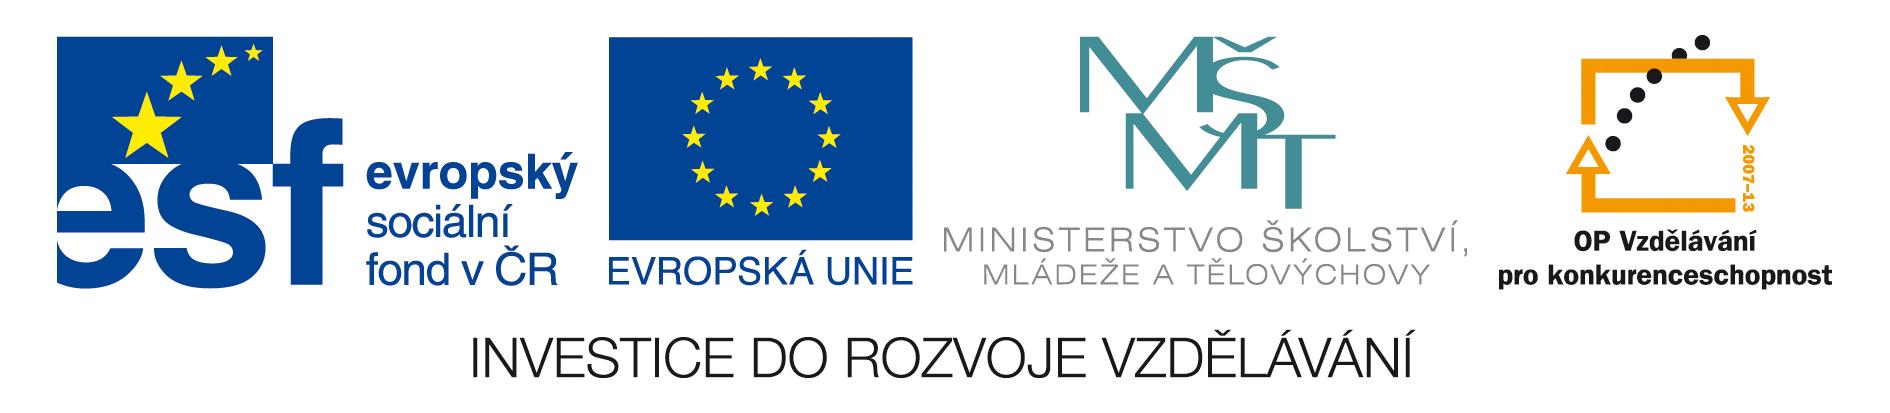 logo-evropsky-socialni-fond-eu-msmt-OP-program